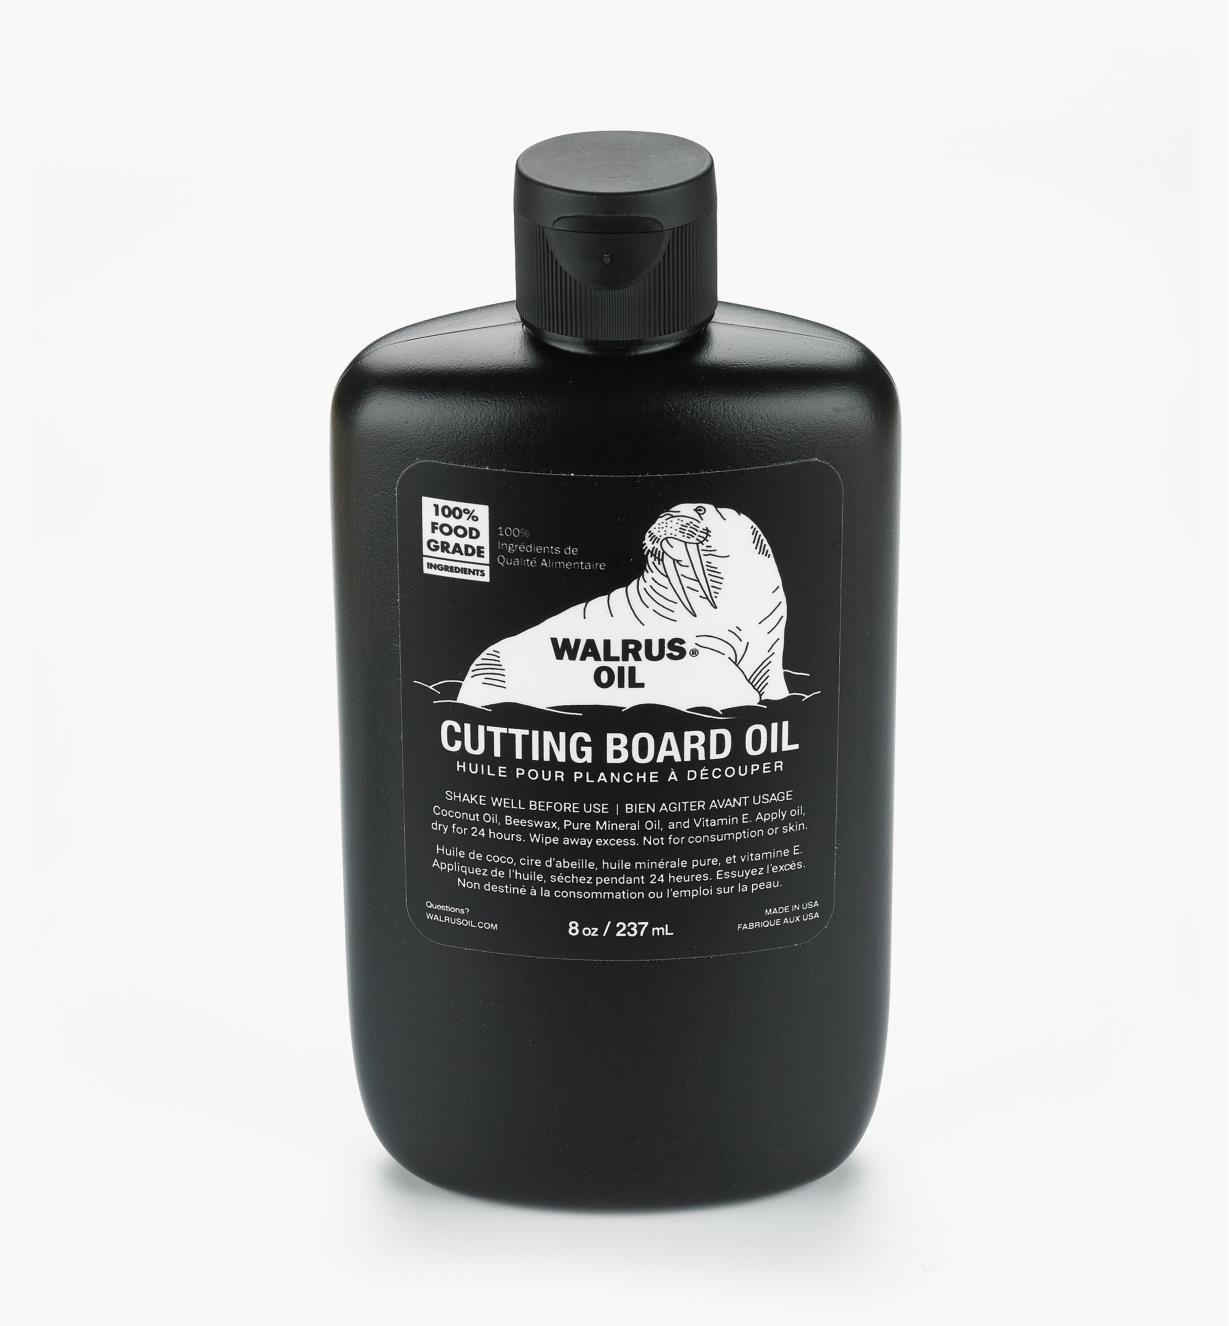 27K2900 - Cutting-Board Oil, 8 oz